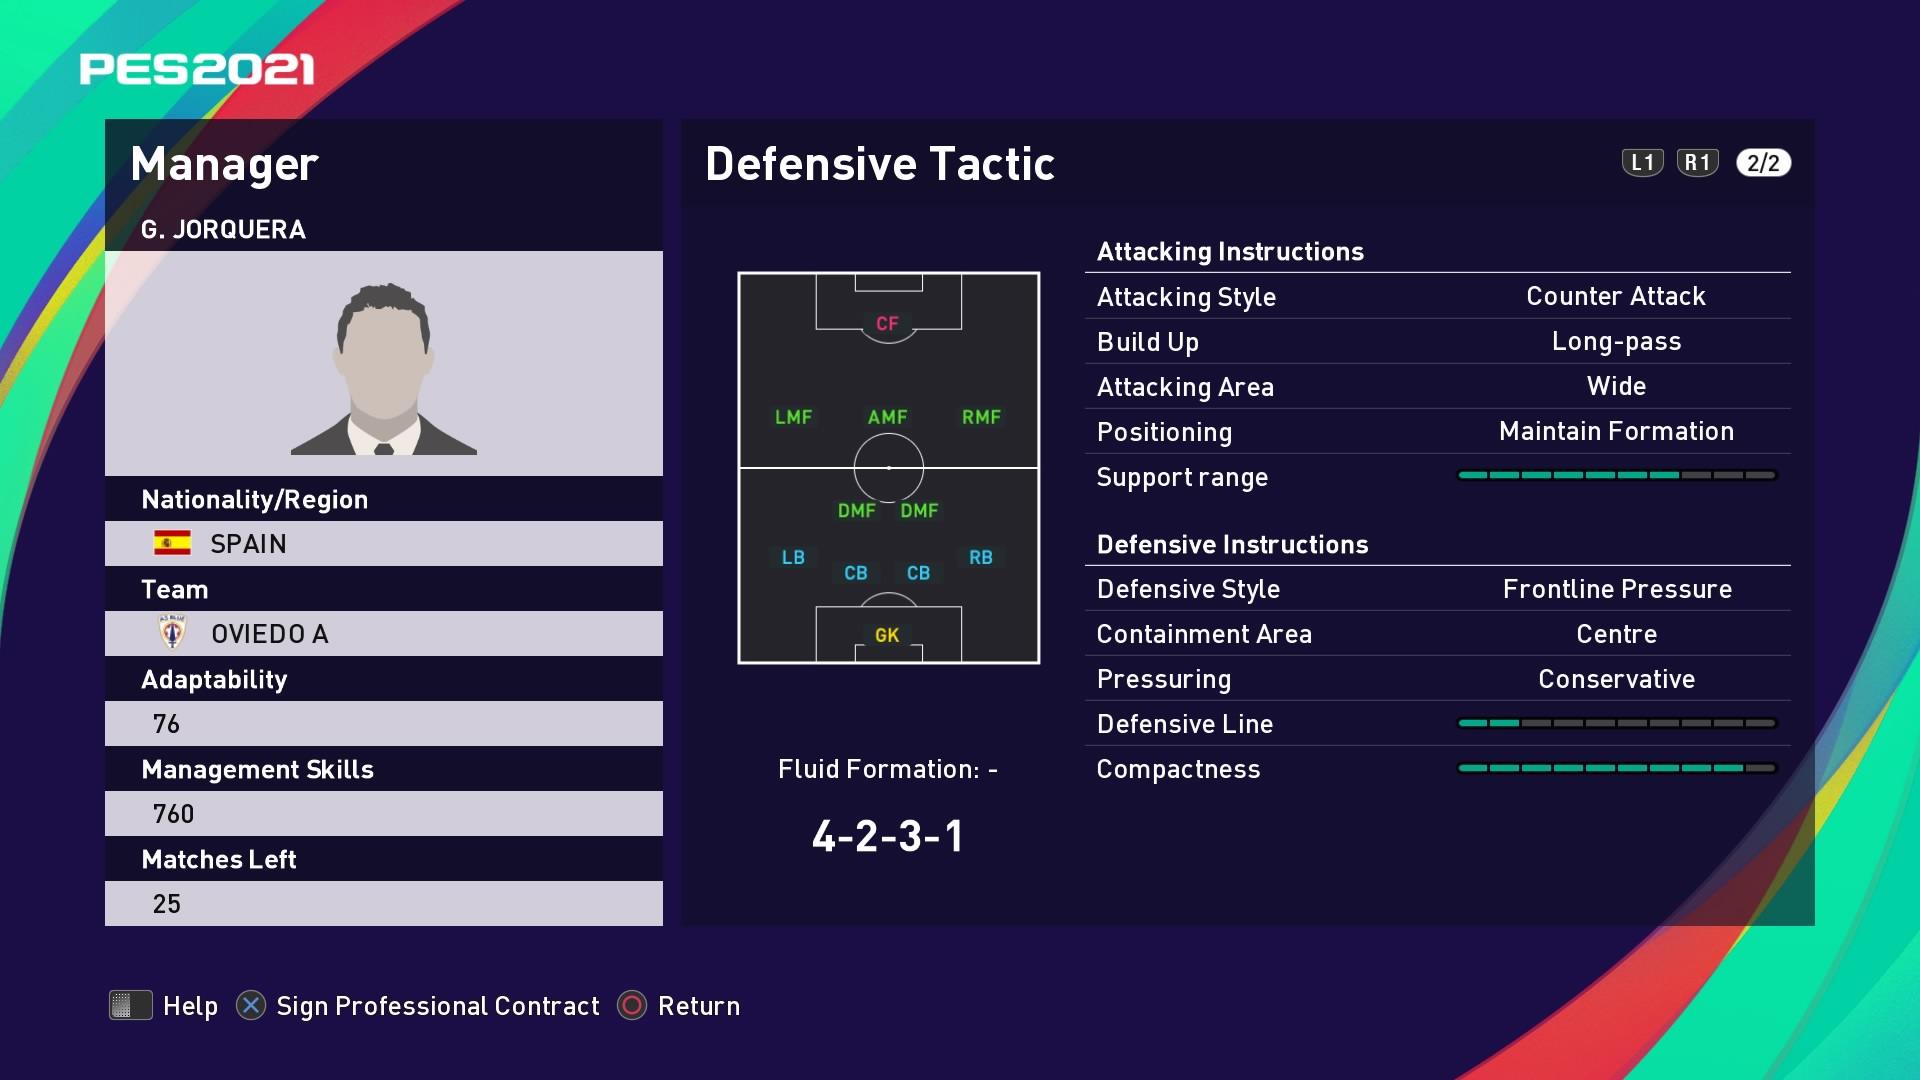 G. Jorquera (José Ángel Ziganda) Defensive Tactic in PES 2021 myClub